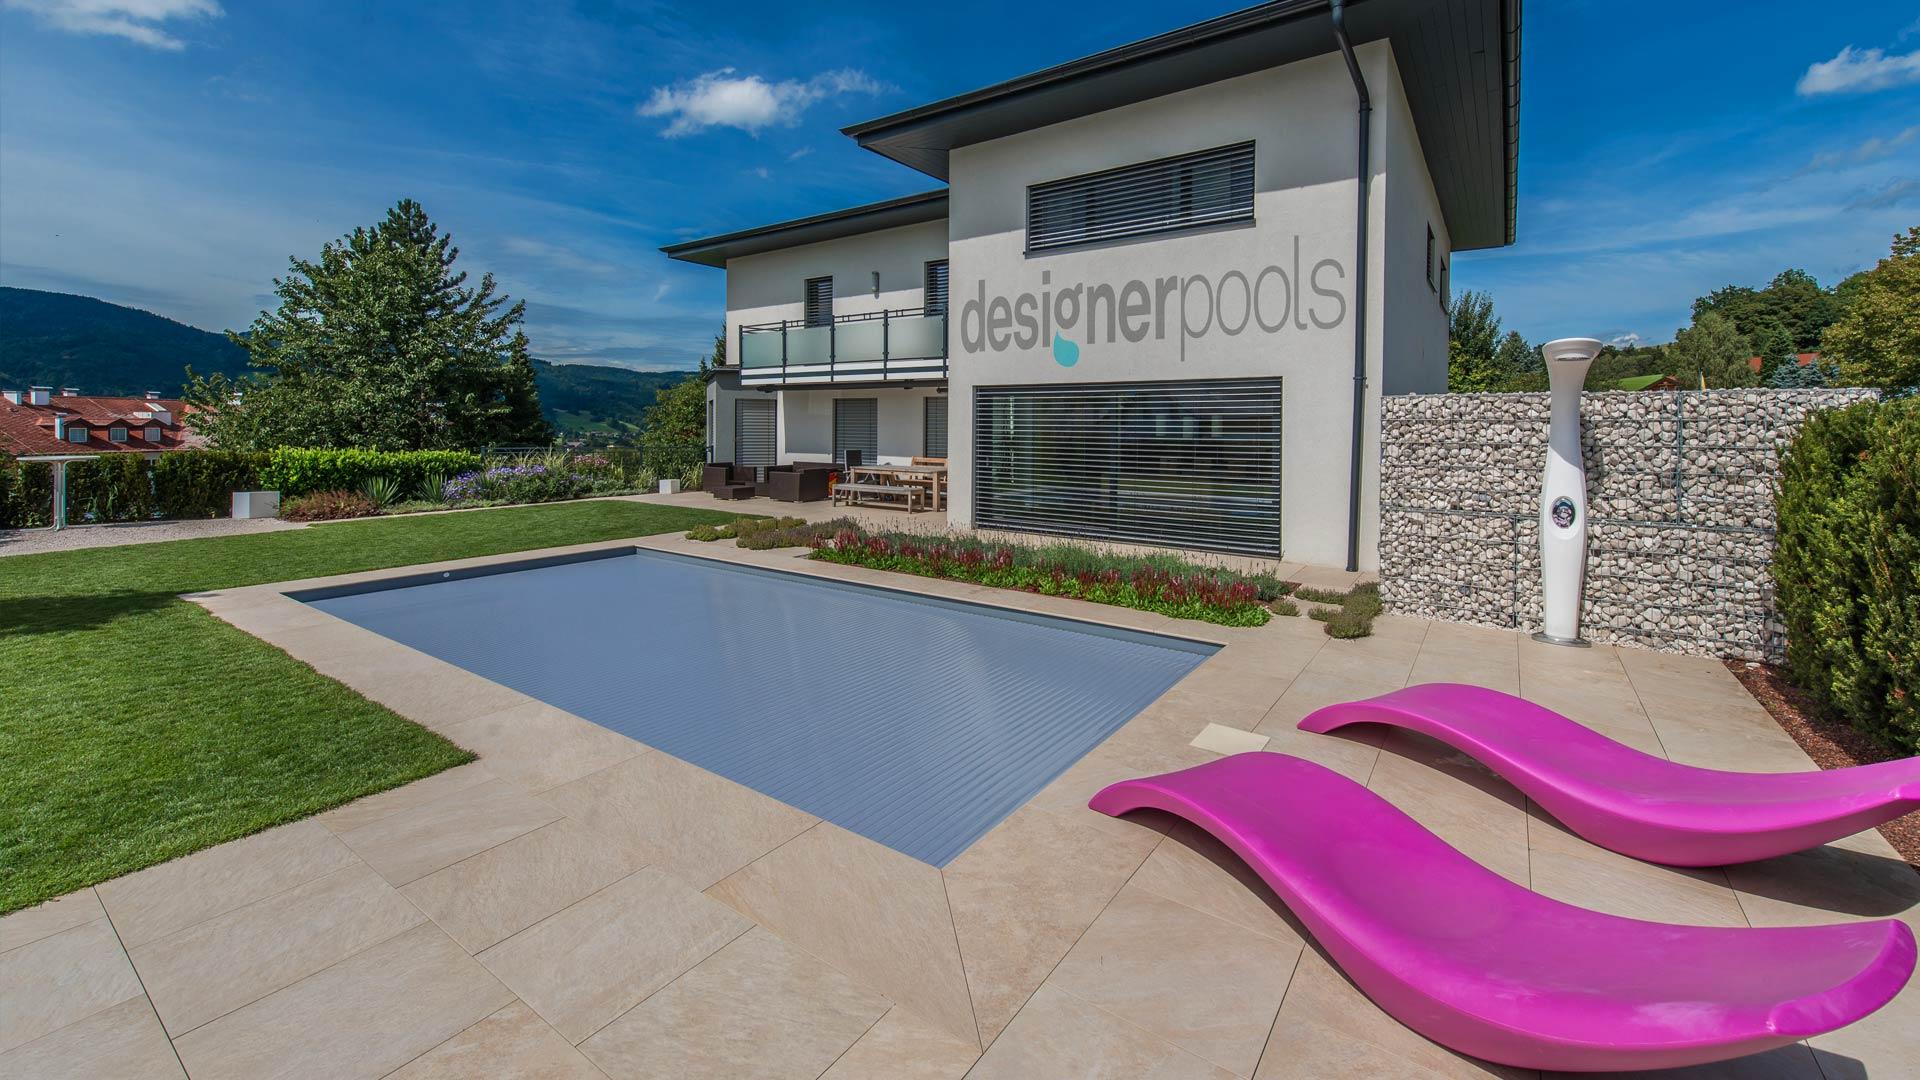 Pool mit geschlossener Rollladenabdeckung - designerpools